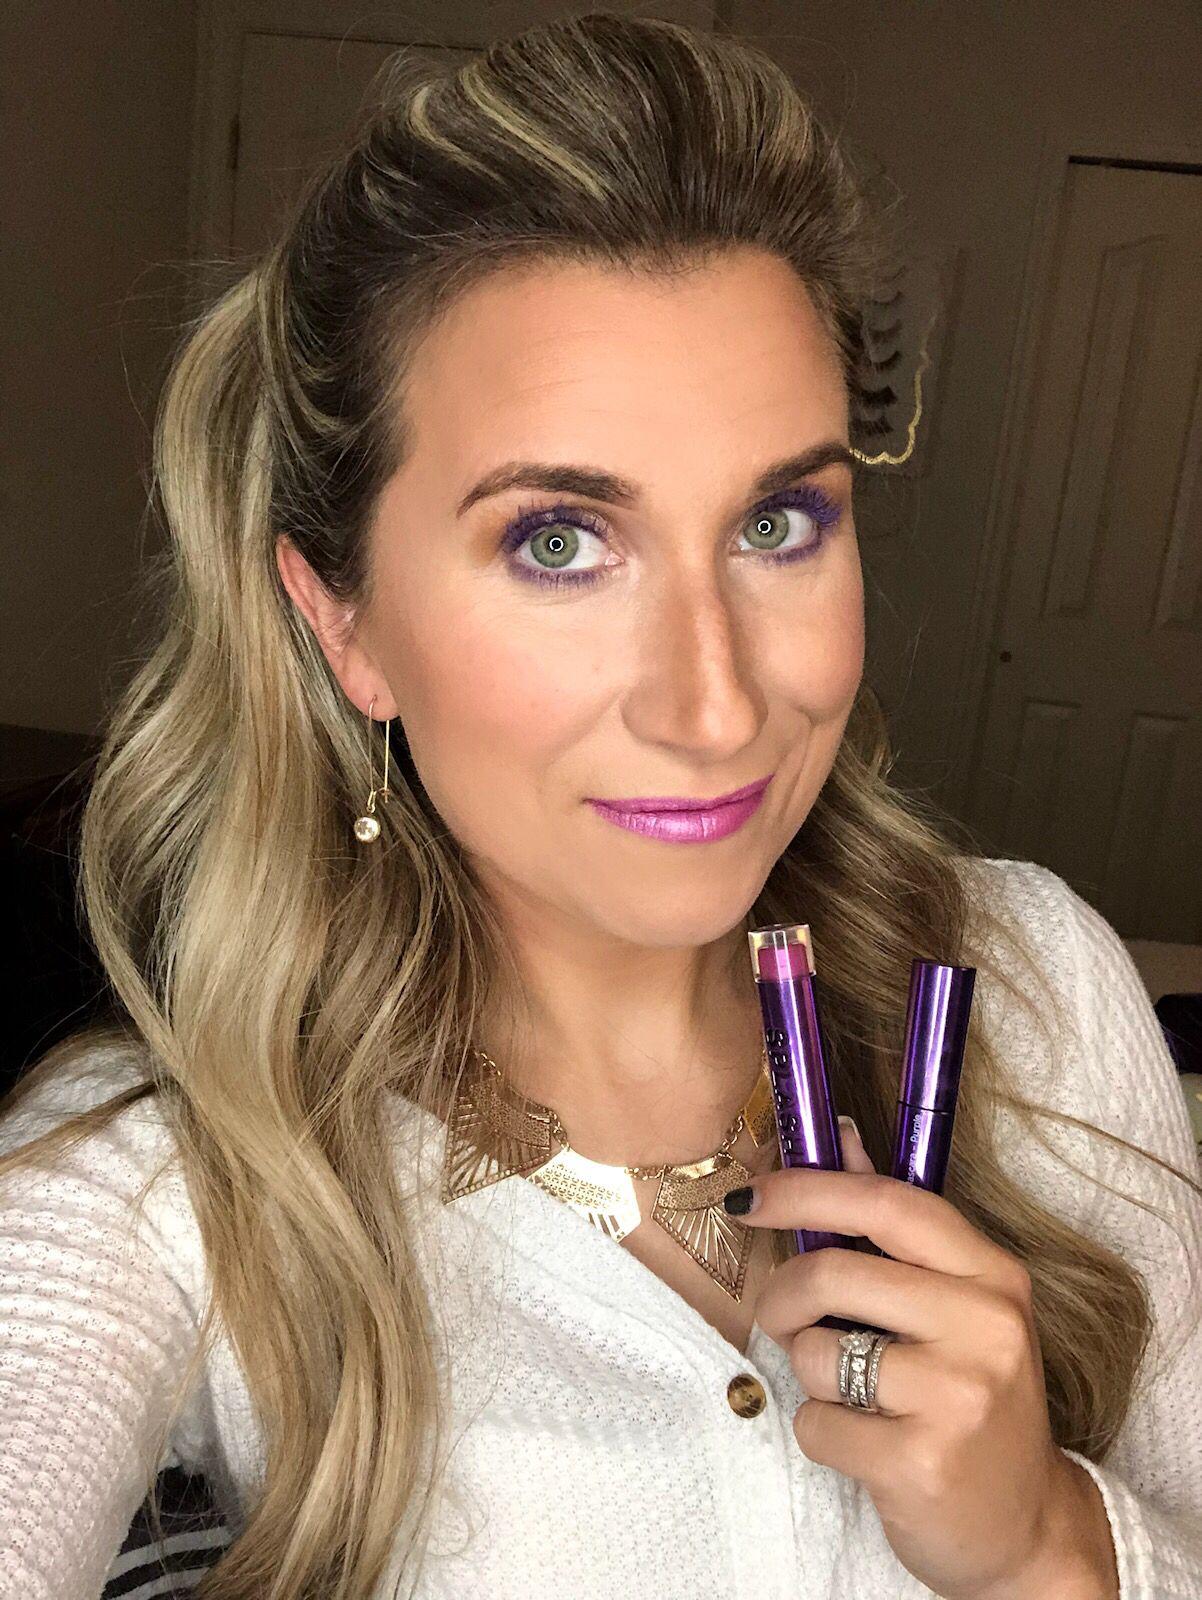 Super trending! Purple mascara and that metallic splash